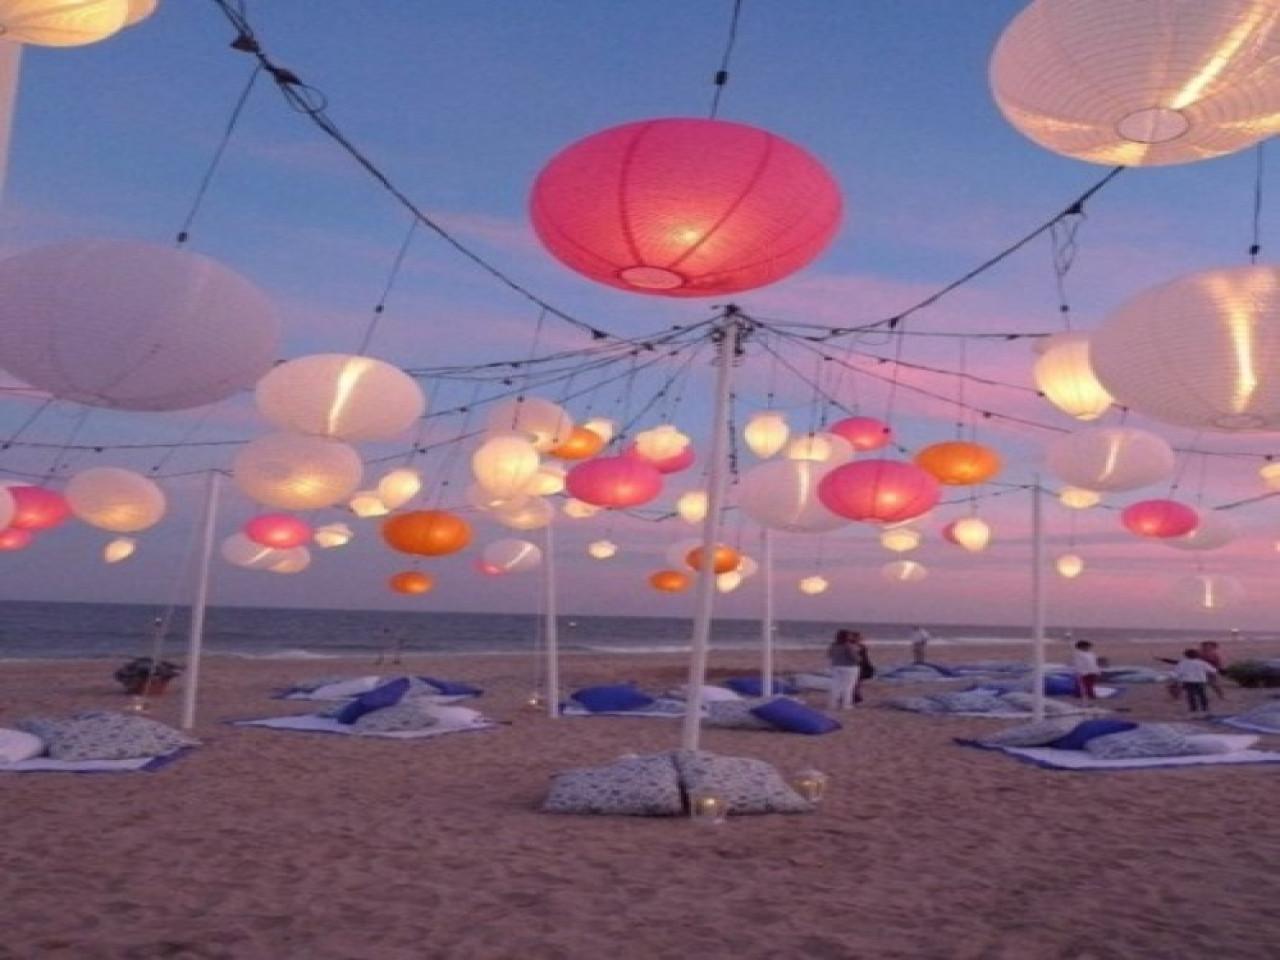 Outdoor Beach Party Ideas  Dinner table centerpieces photos cool summer party ideas